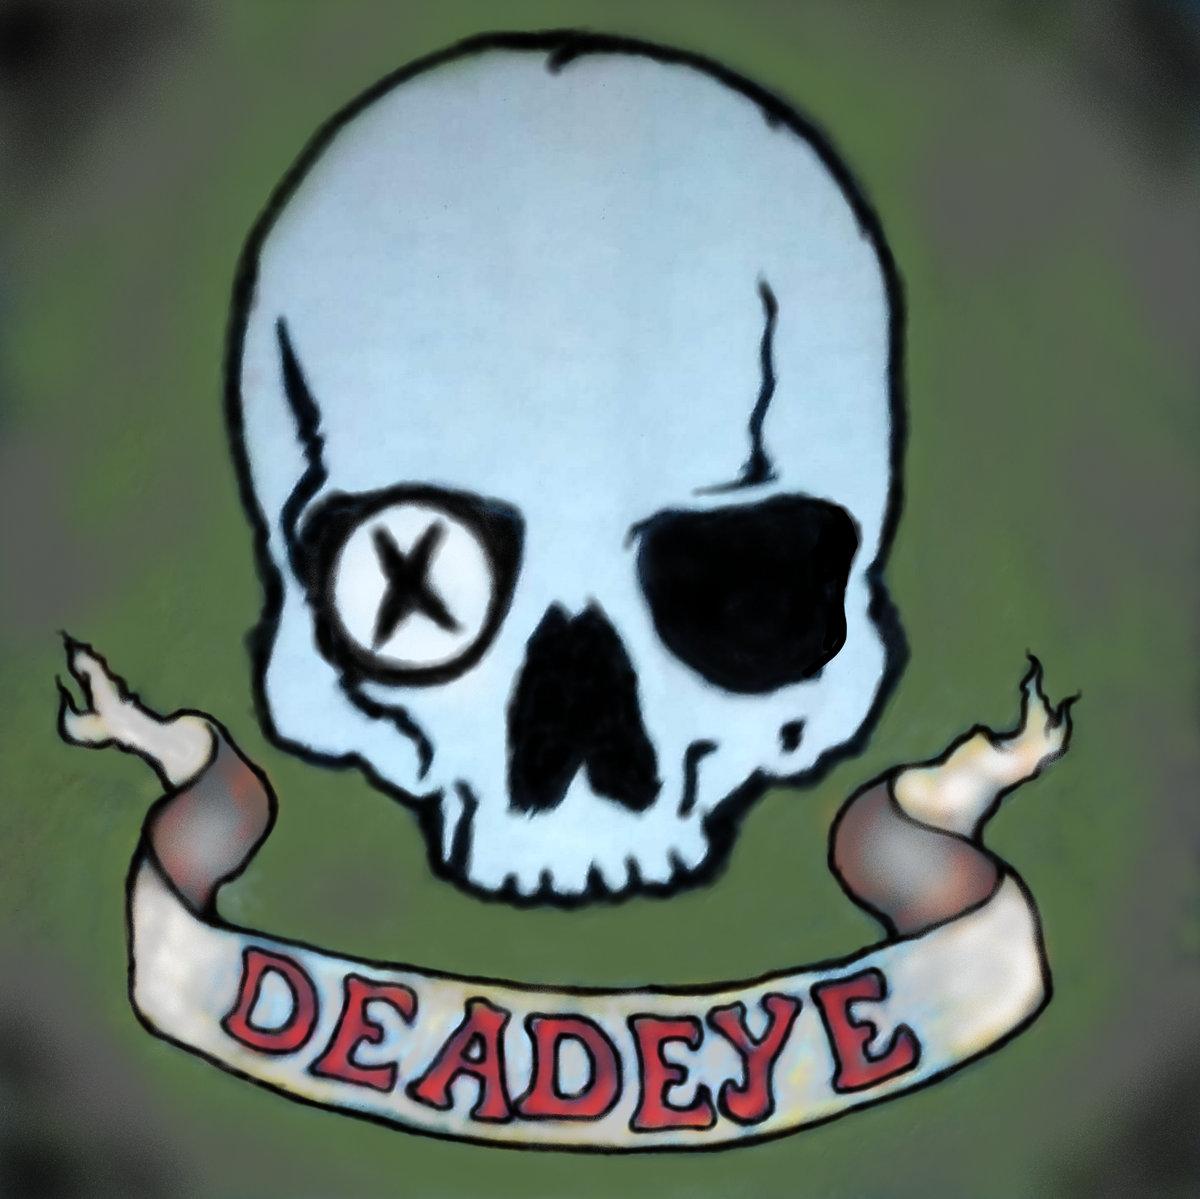 Deadeye Avatar